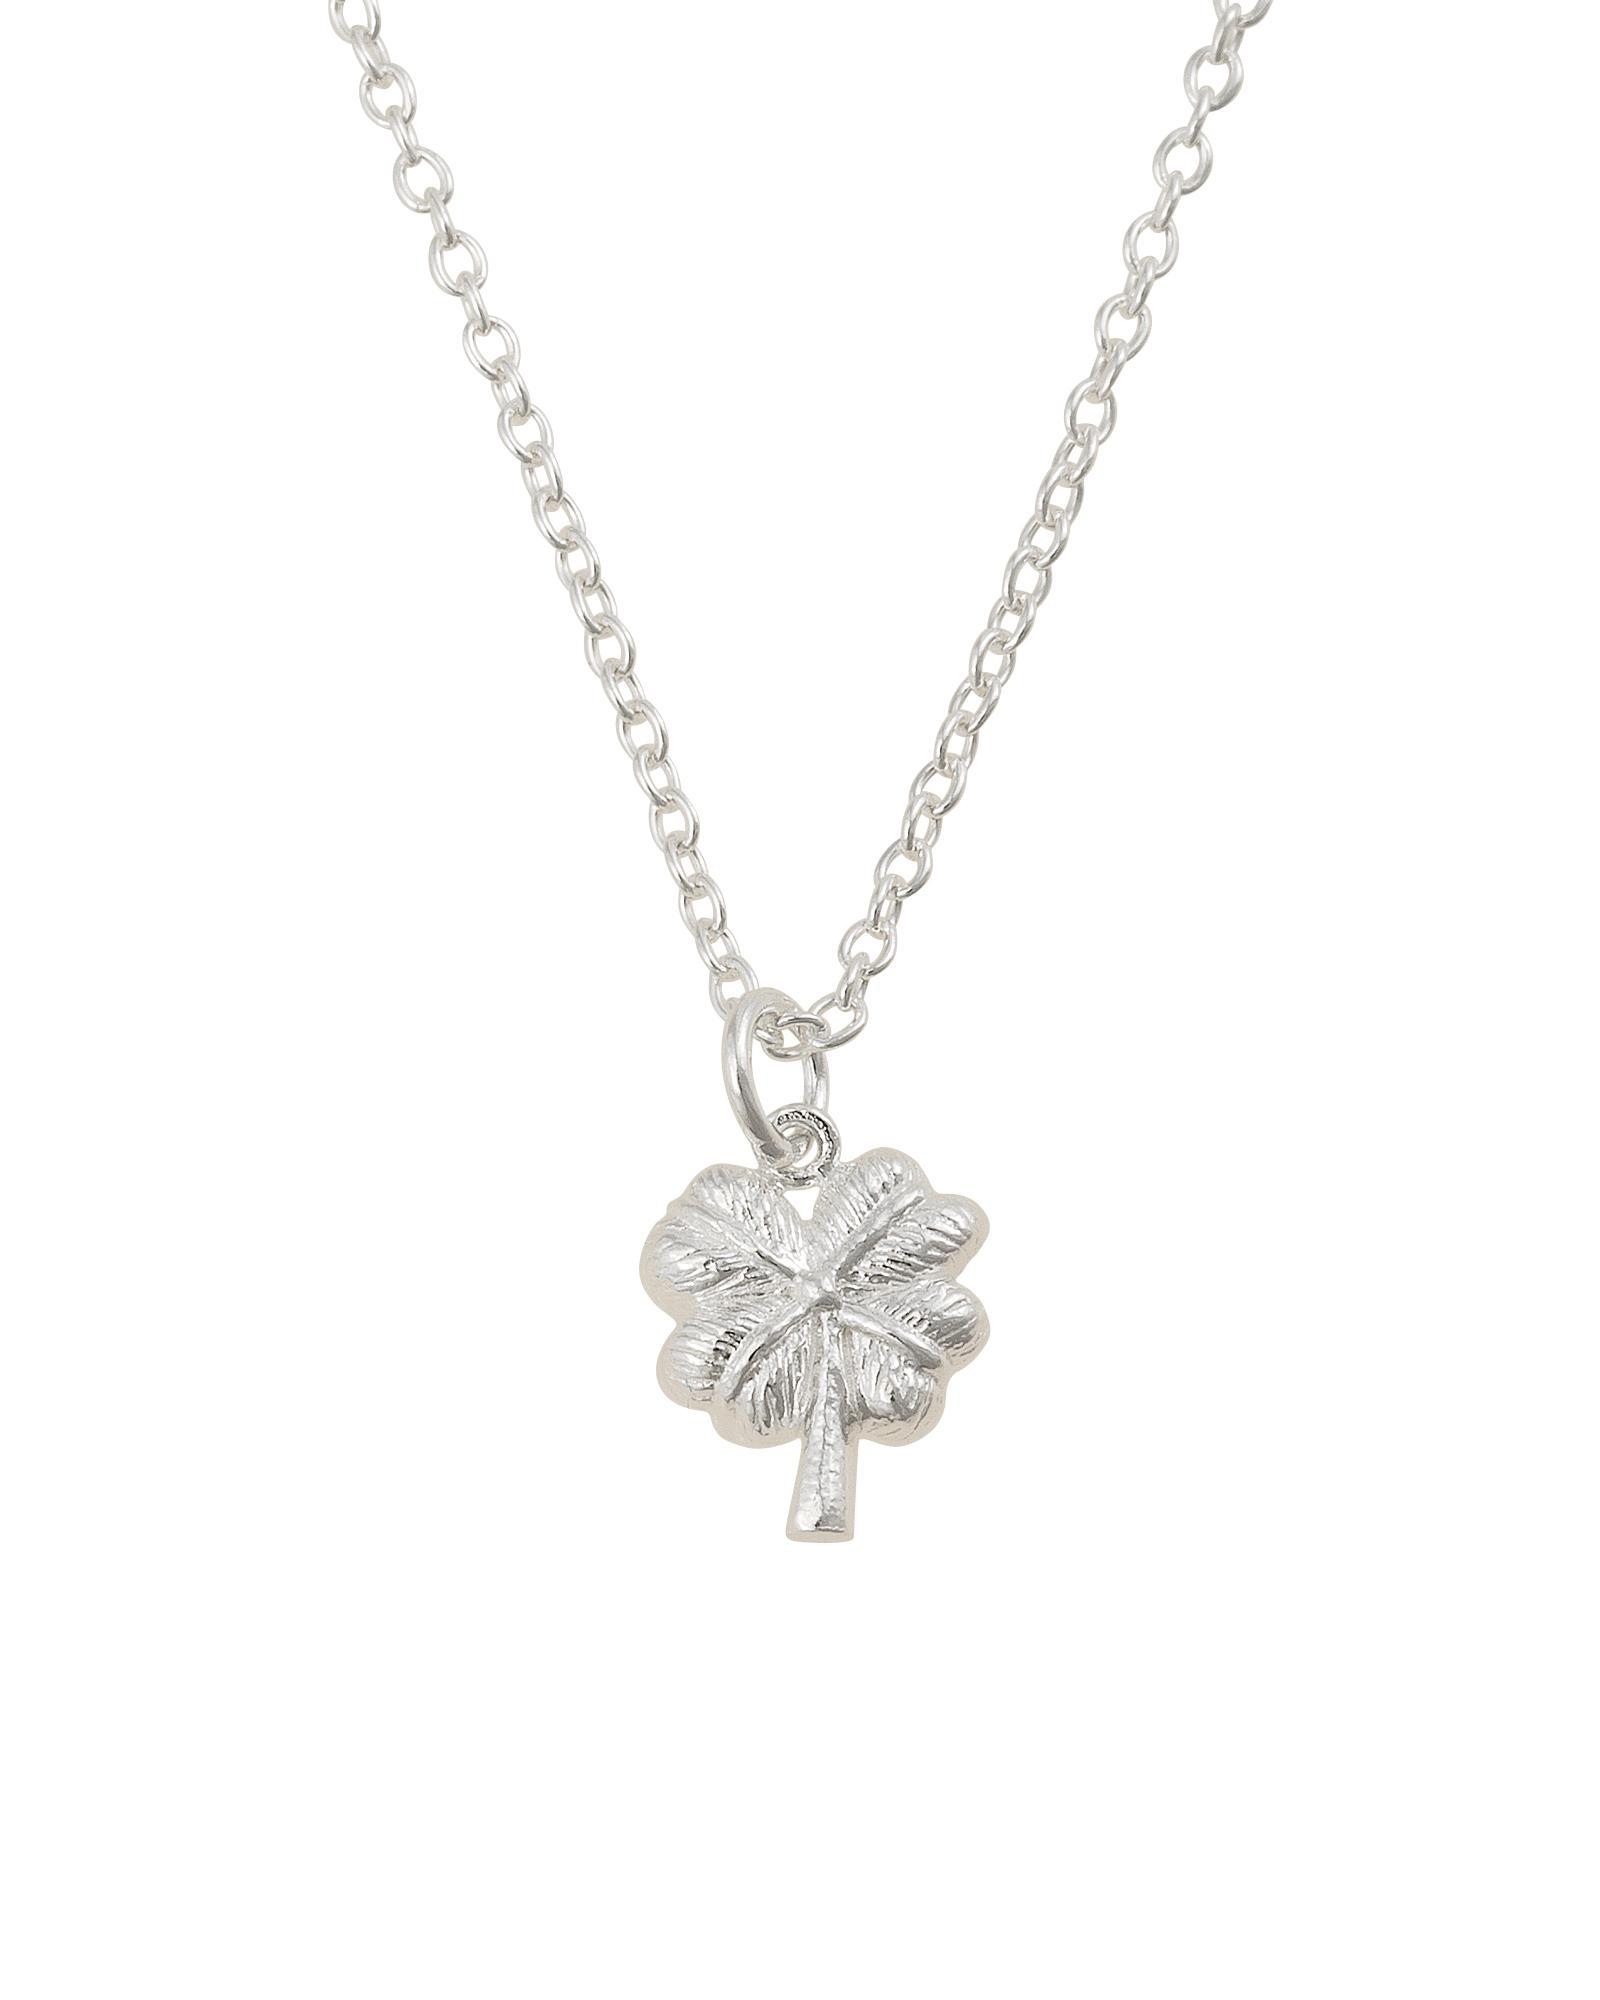 b77d6b2b0 Oliver Bonas Four Leaf Clover Silver Pendant Necklace in Metallic - Lyst